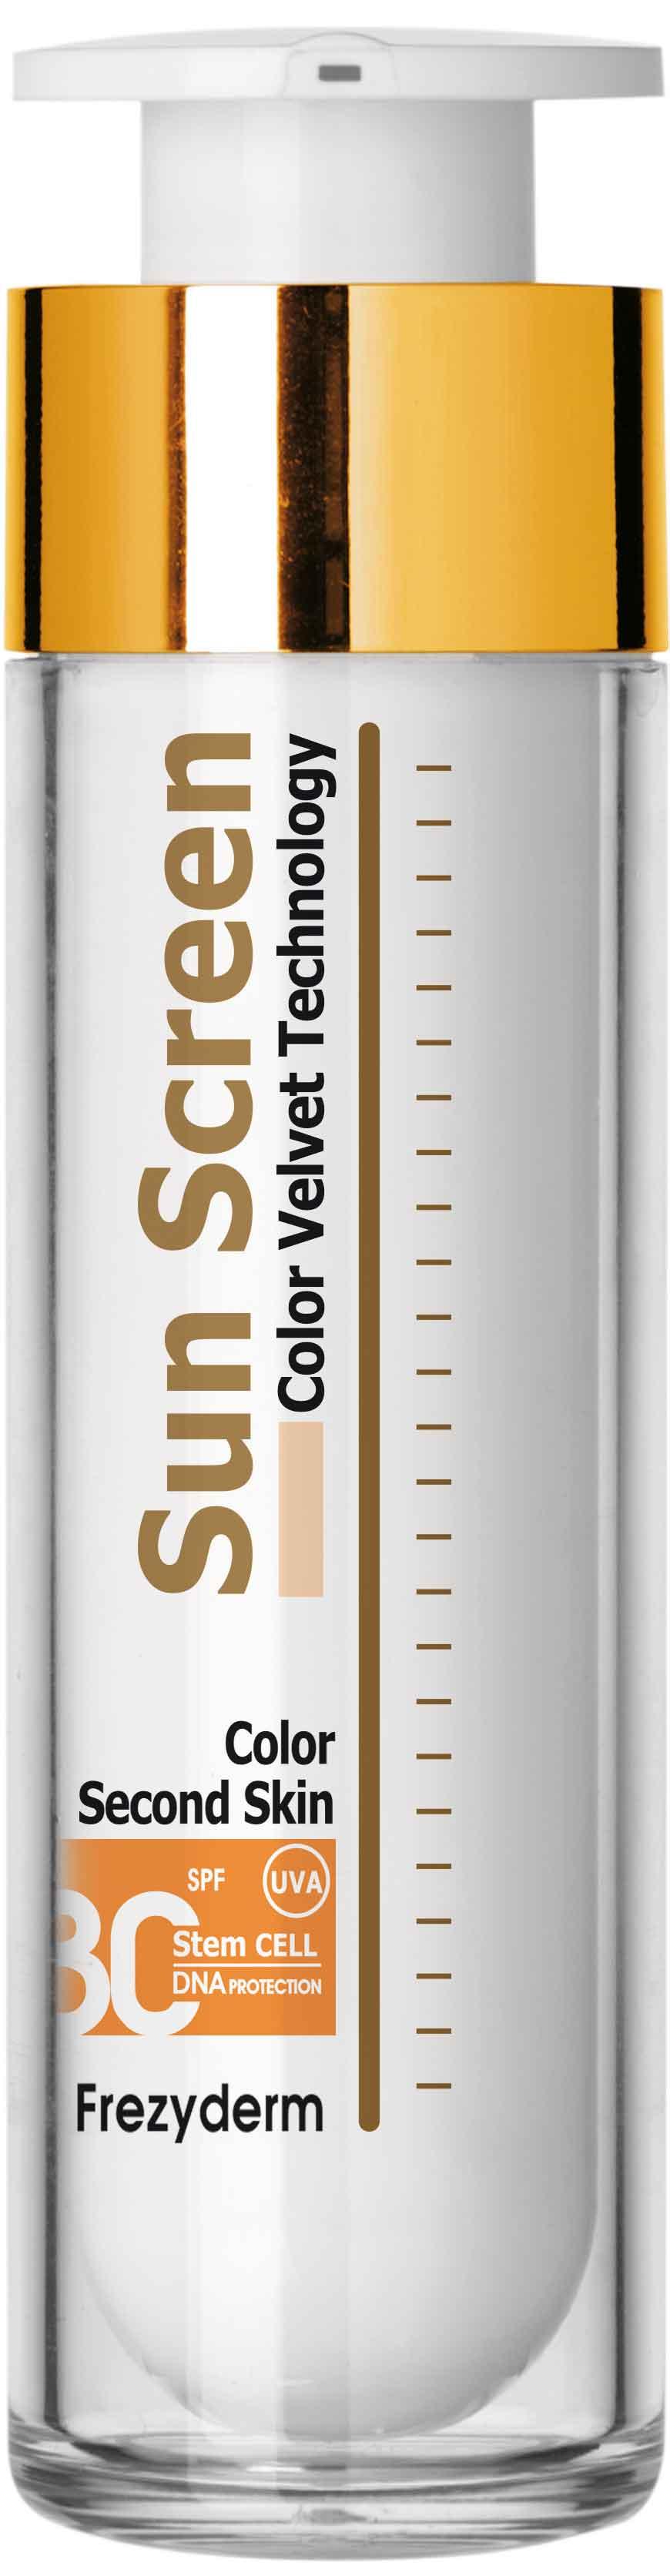 Frezyderm Sun Screen Color Velvet Face Cream SPF30, 50ml